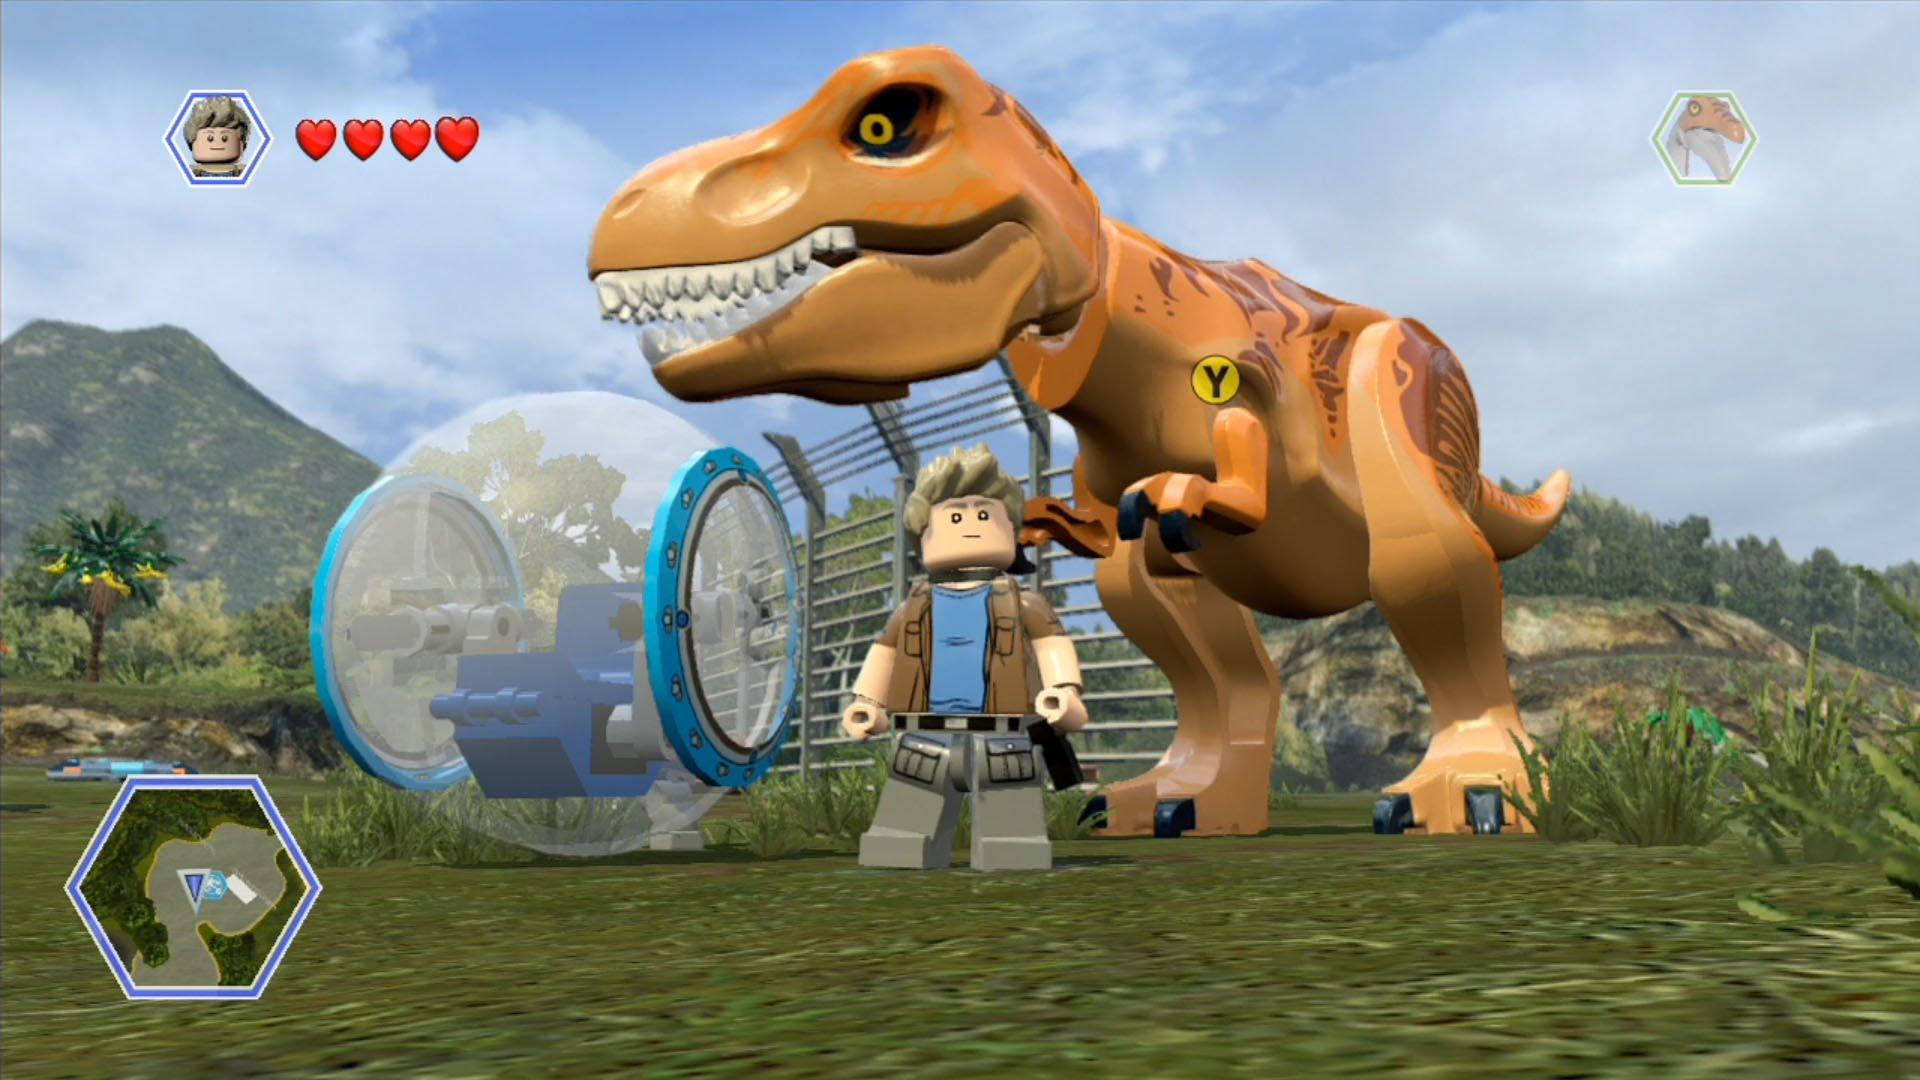 Lego Jurassic World version for PC - GamesKnit